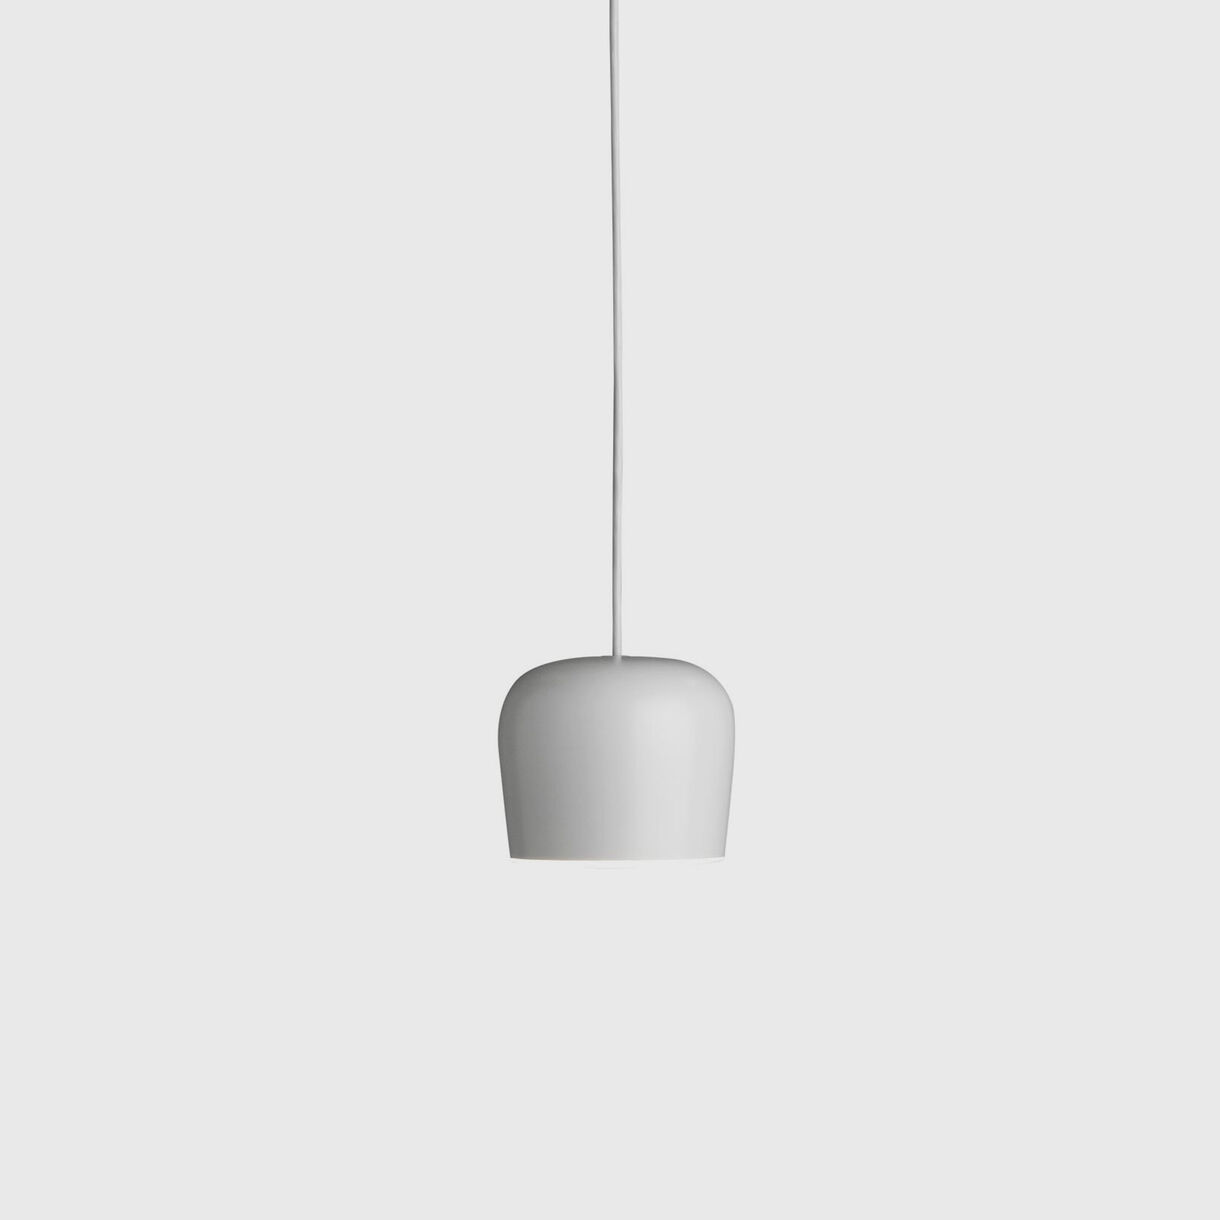 Aim Fixed Suspension Light, White